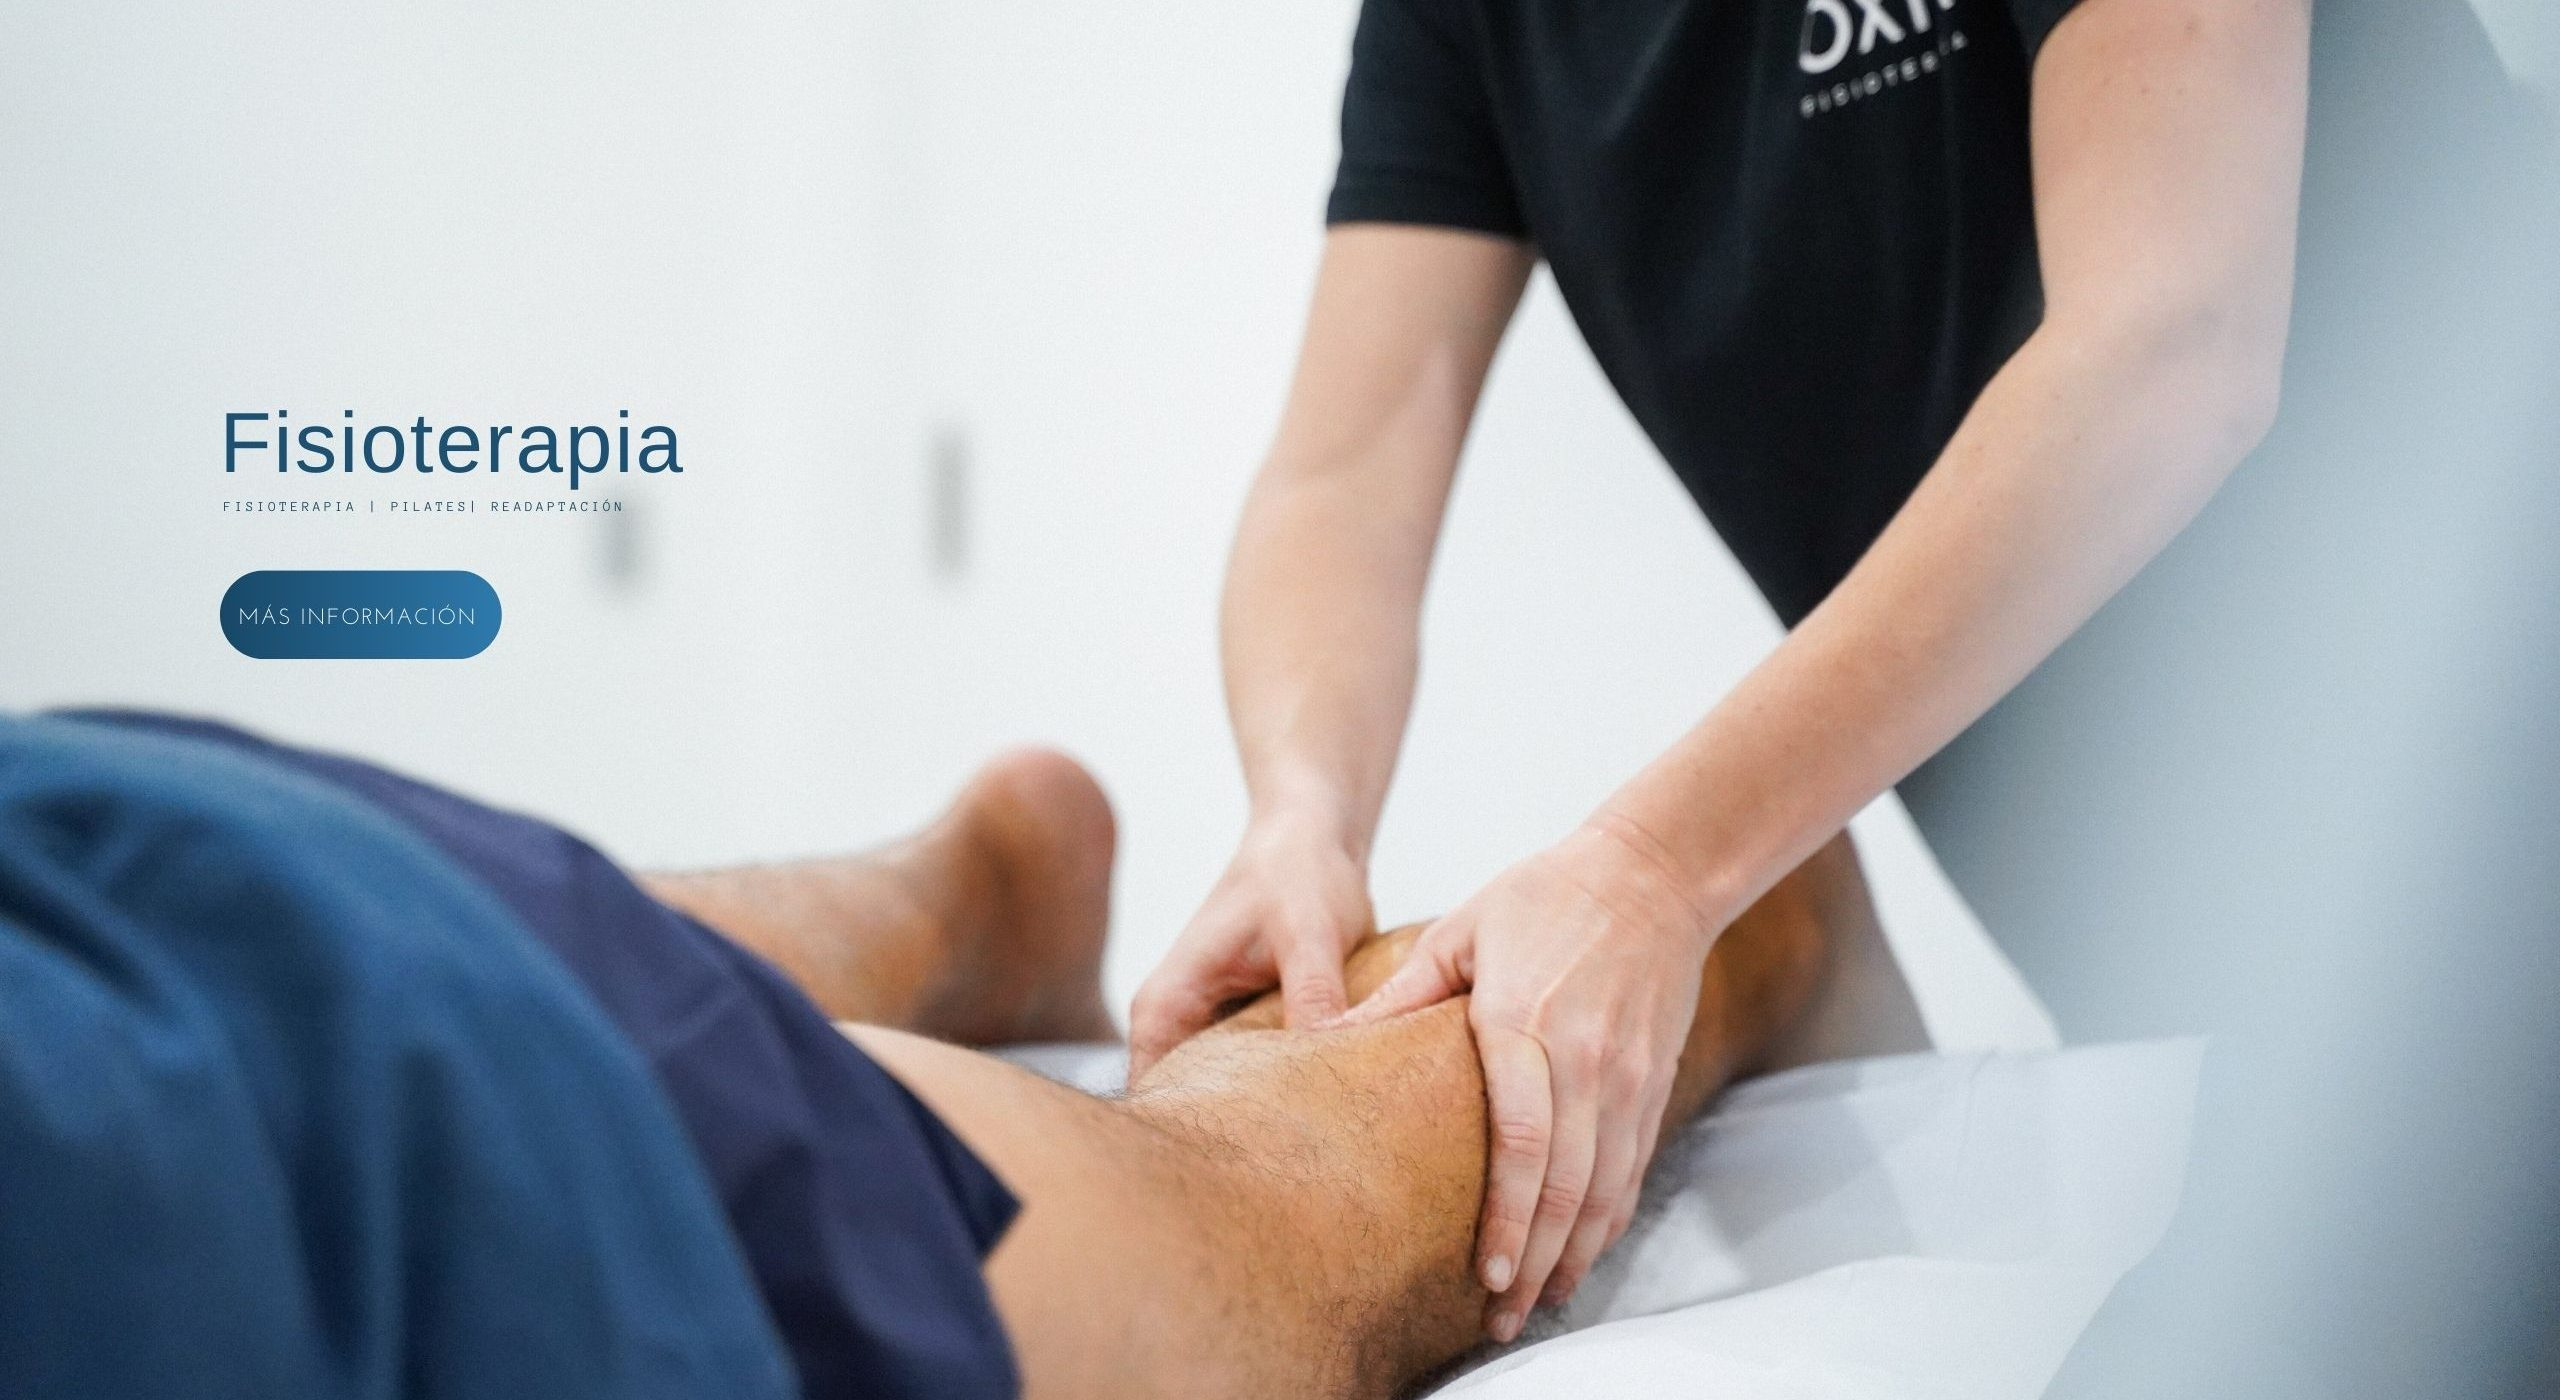 fisioterapia pilates Tenerife Sur, physiotherapy tenerife, pilates in tenerife south